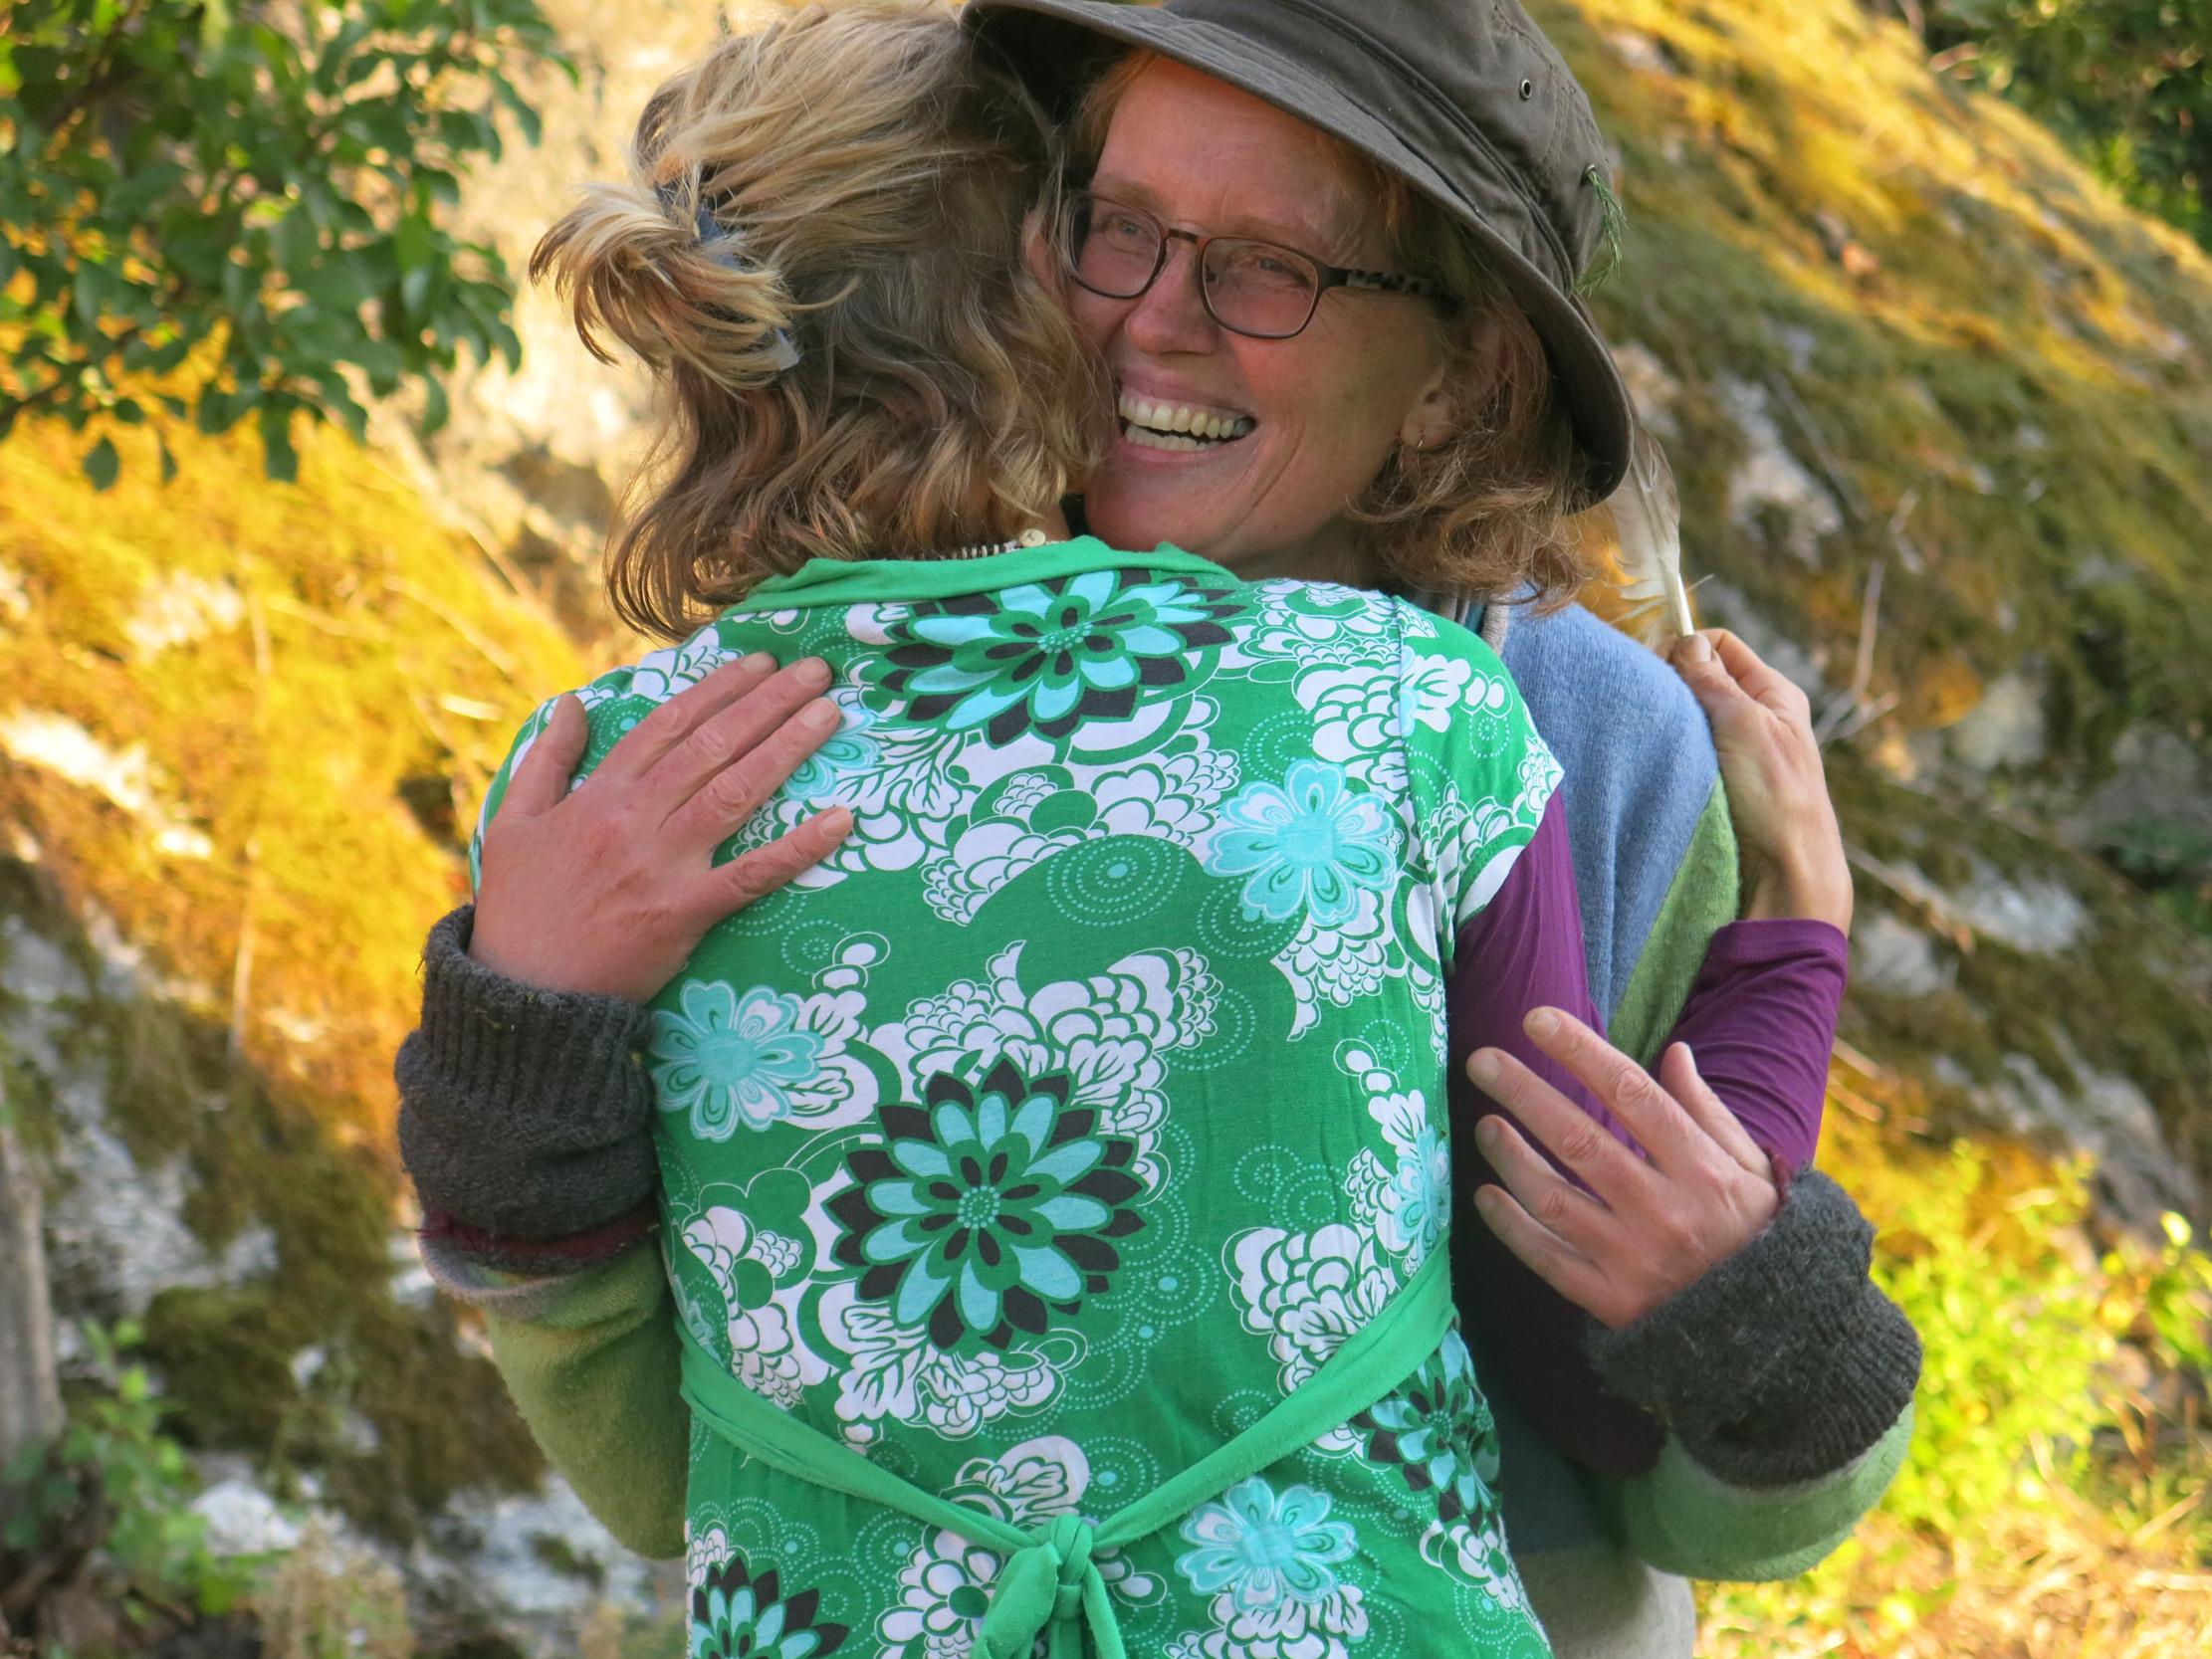 naturverbundene Ritualarbeit für Lebensübergänge begleiten